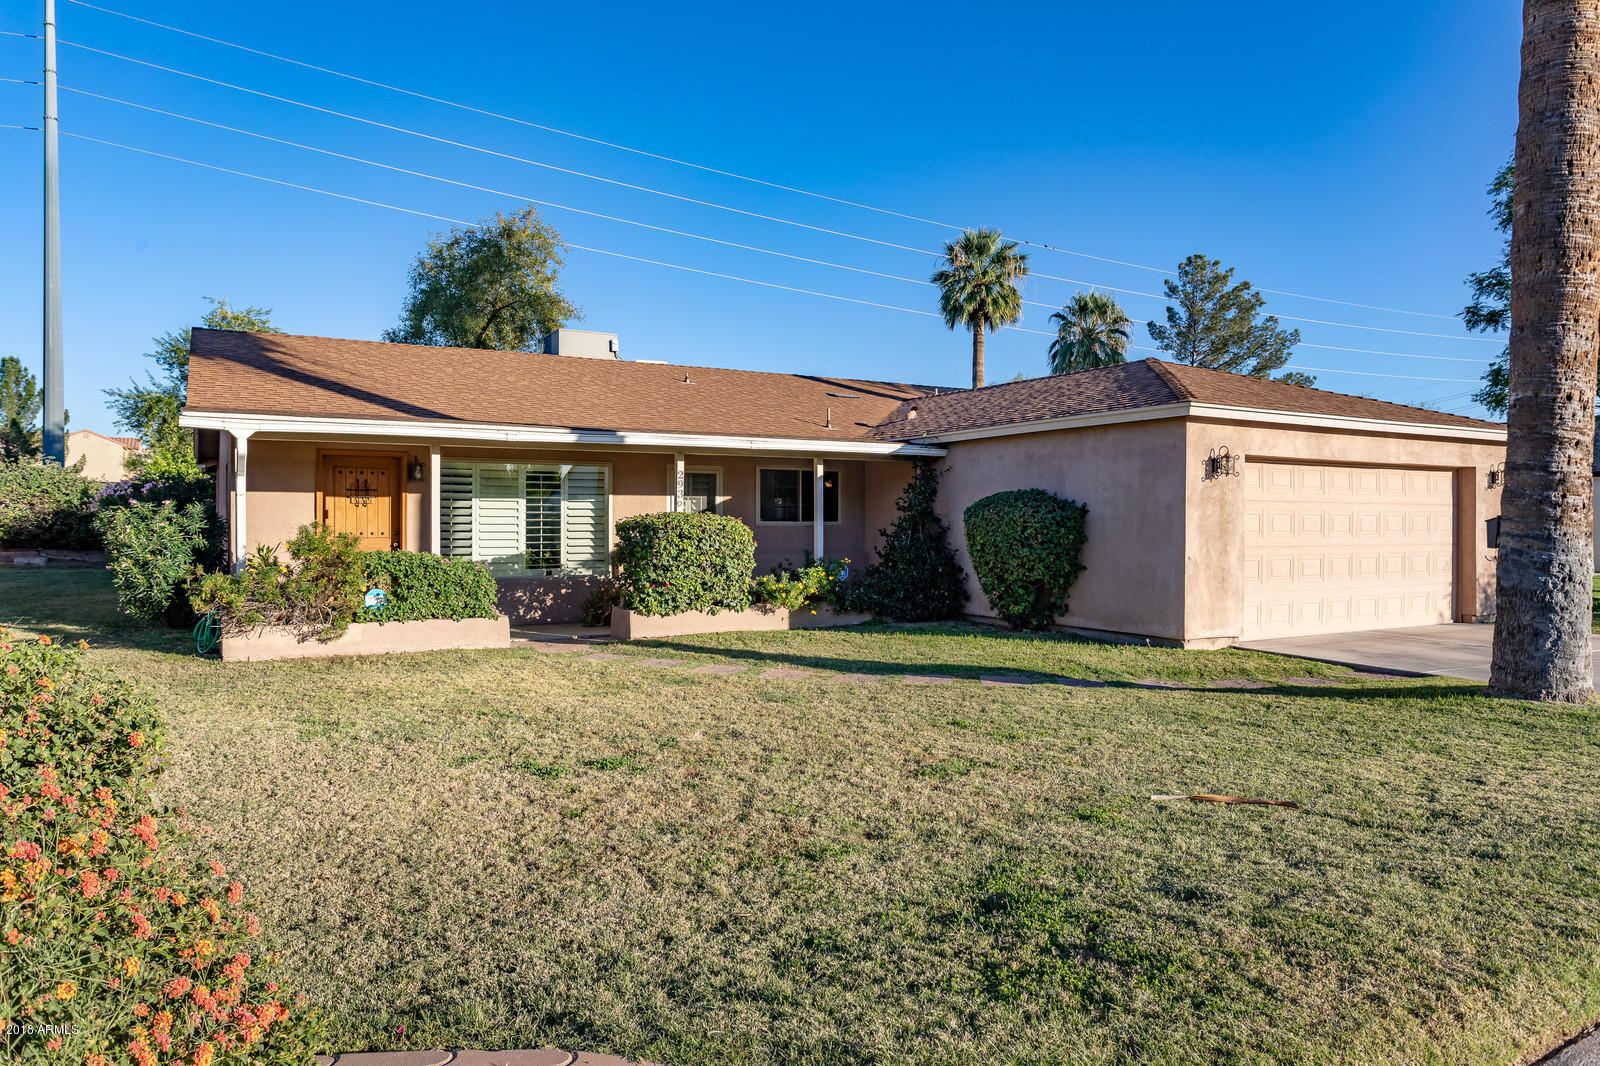 Photo of 2939 N 47TH Place, Phoenix, AZ 85018